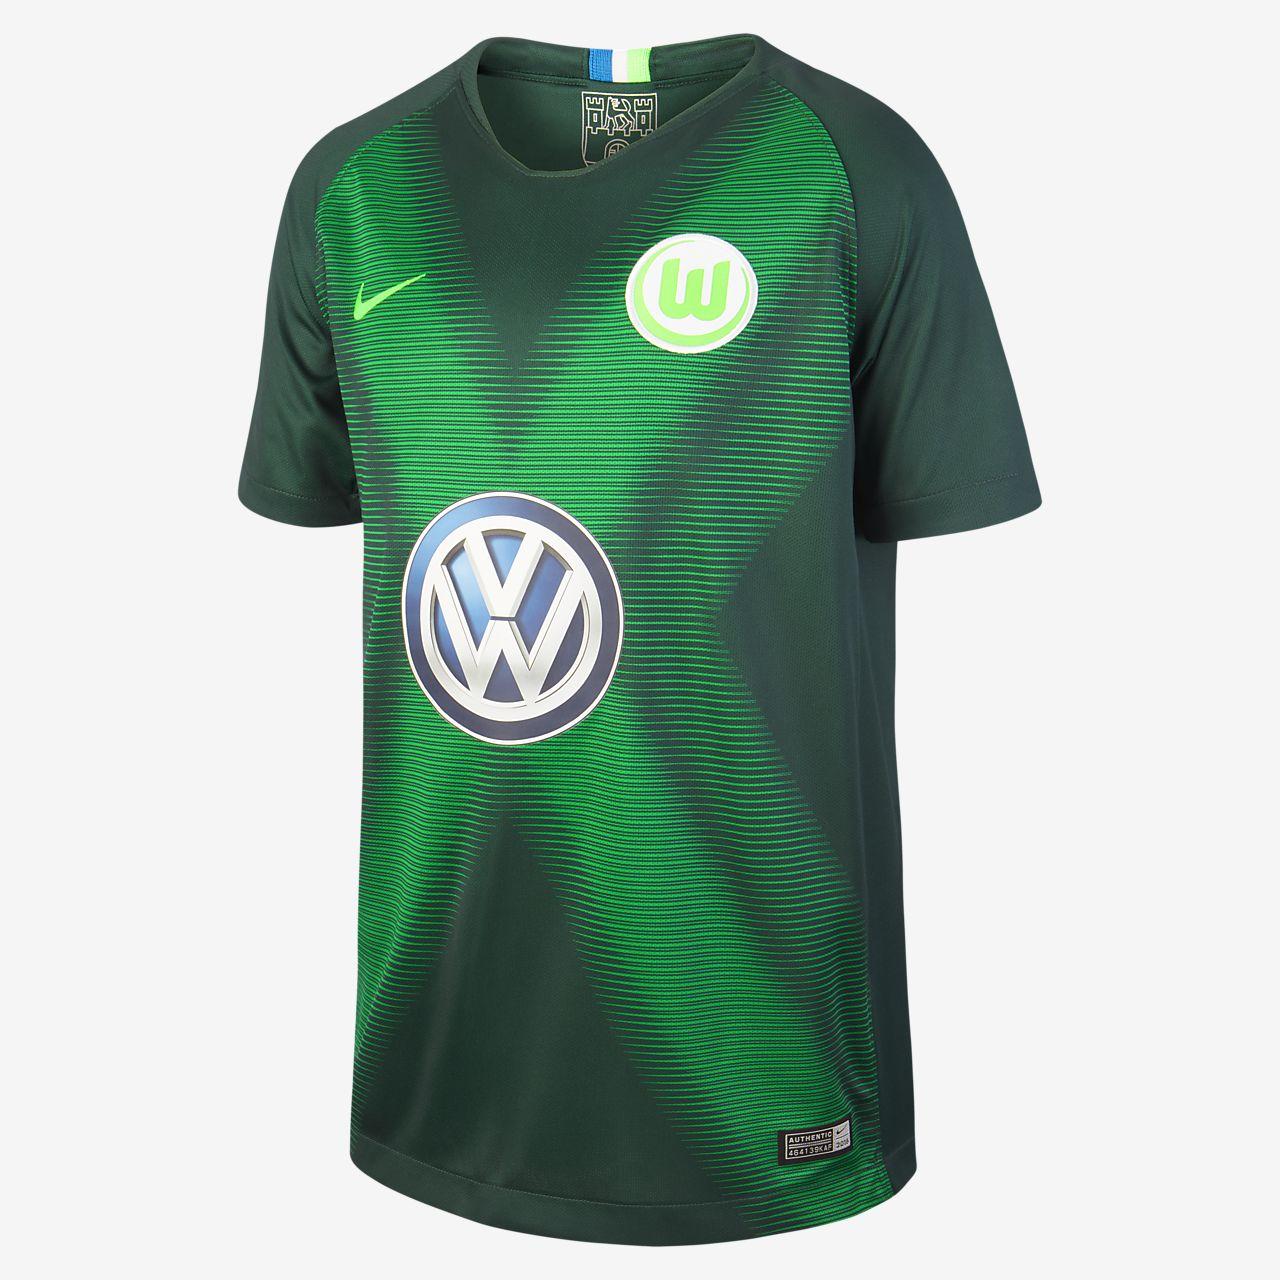 Camisola de futebol 2018 19 VfL Wolfsburg Stadium Home Júnior. Nike ... d60d7db2f0cae